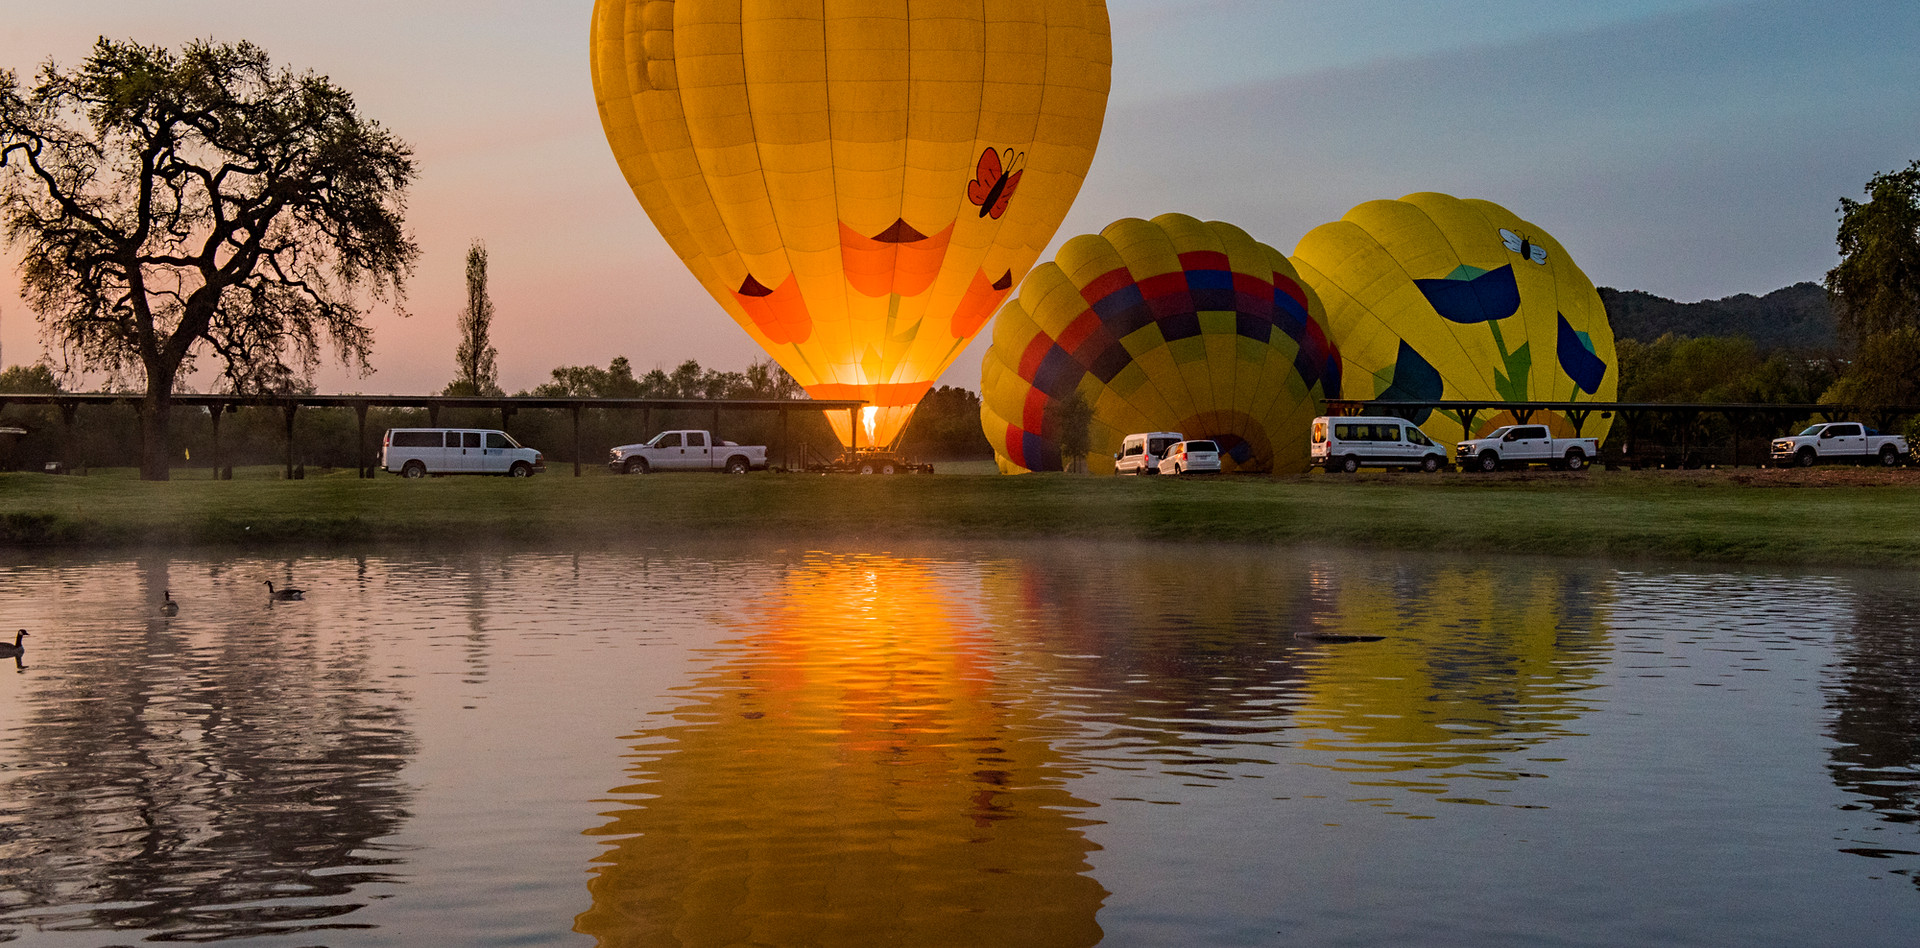 Balloons Reflected